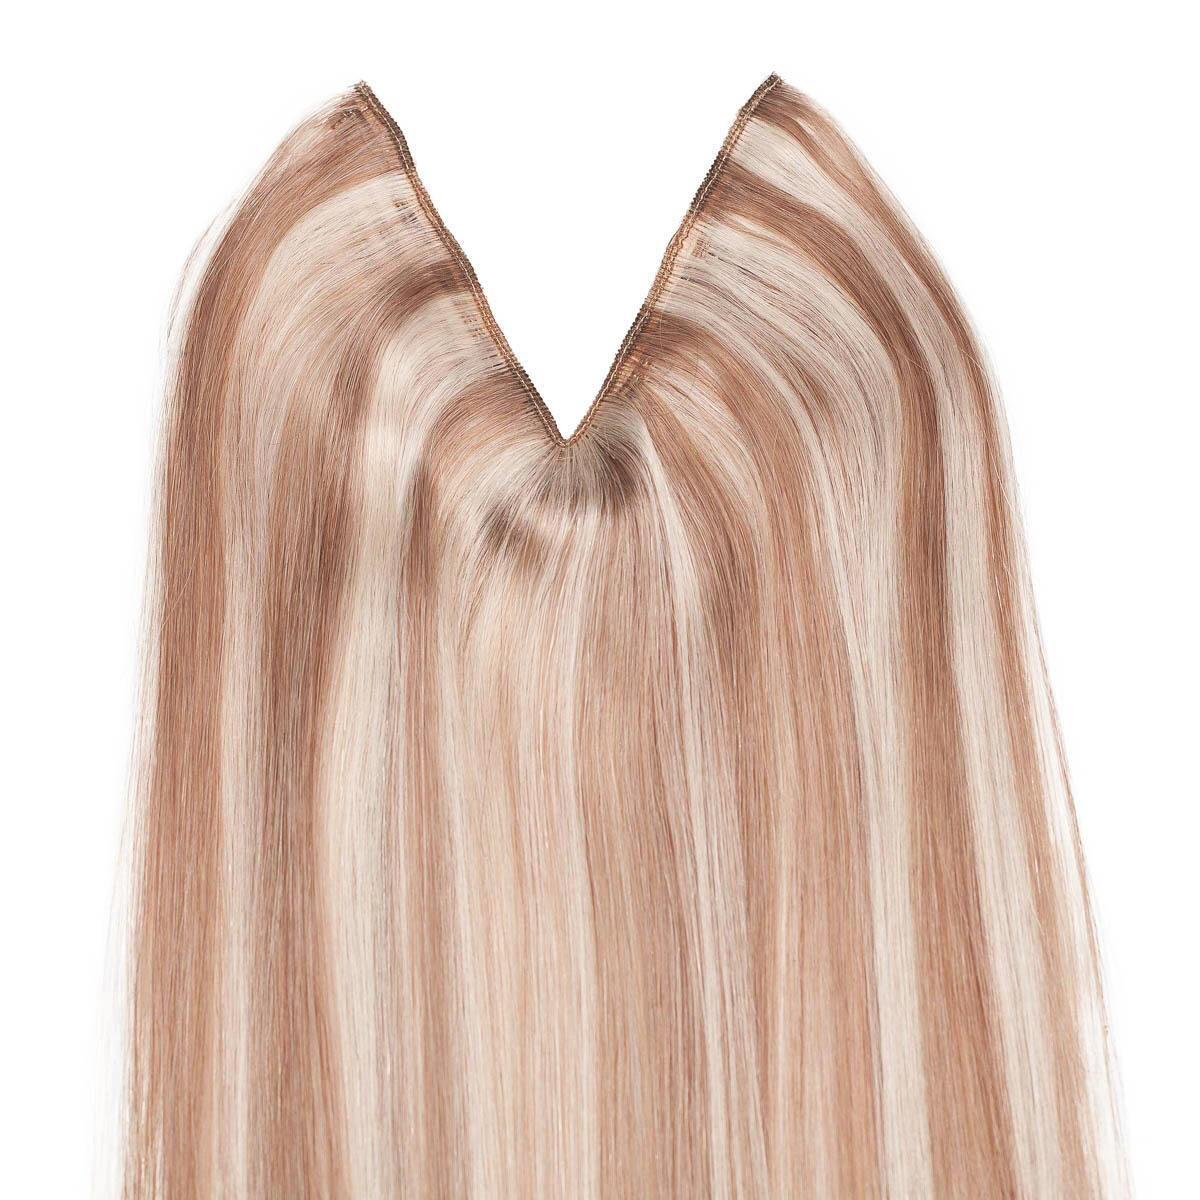 Easy Clip-in M7.1/10.8 Natural Ash Blonde Mix 50 cm